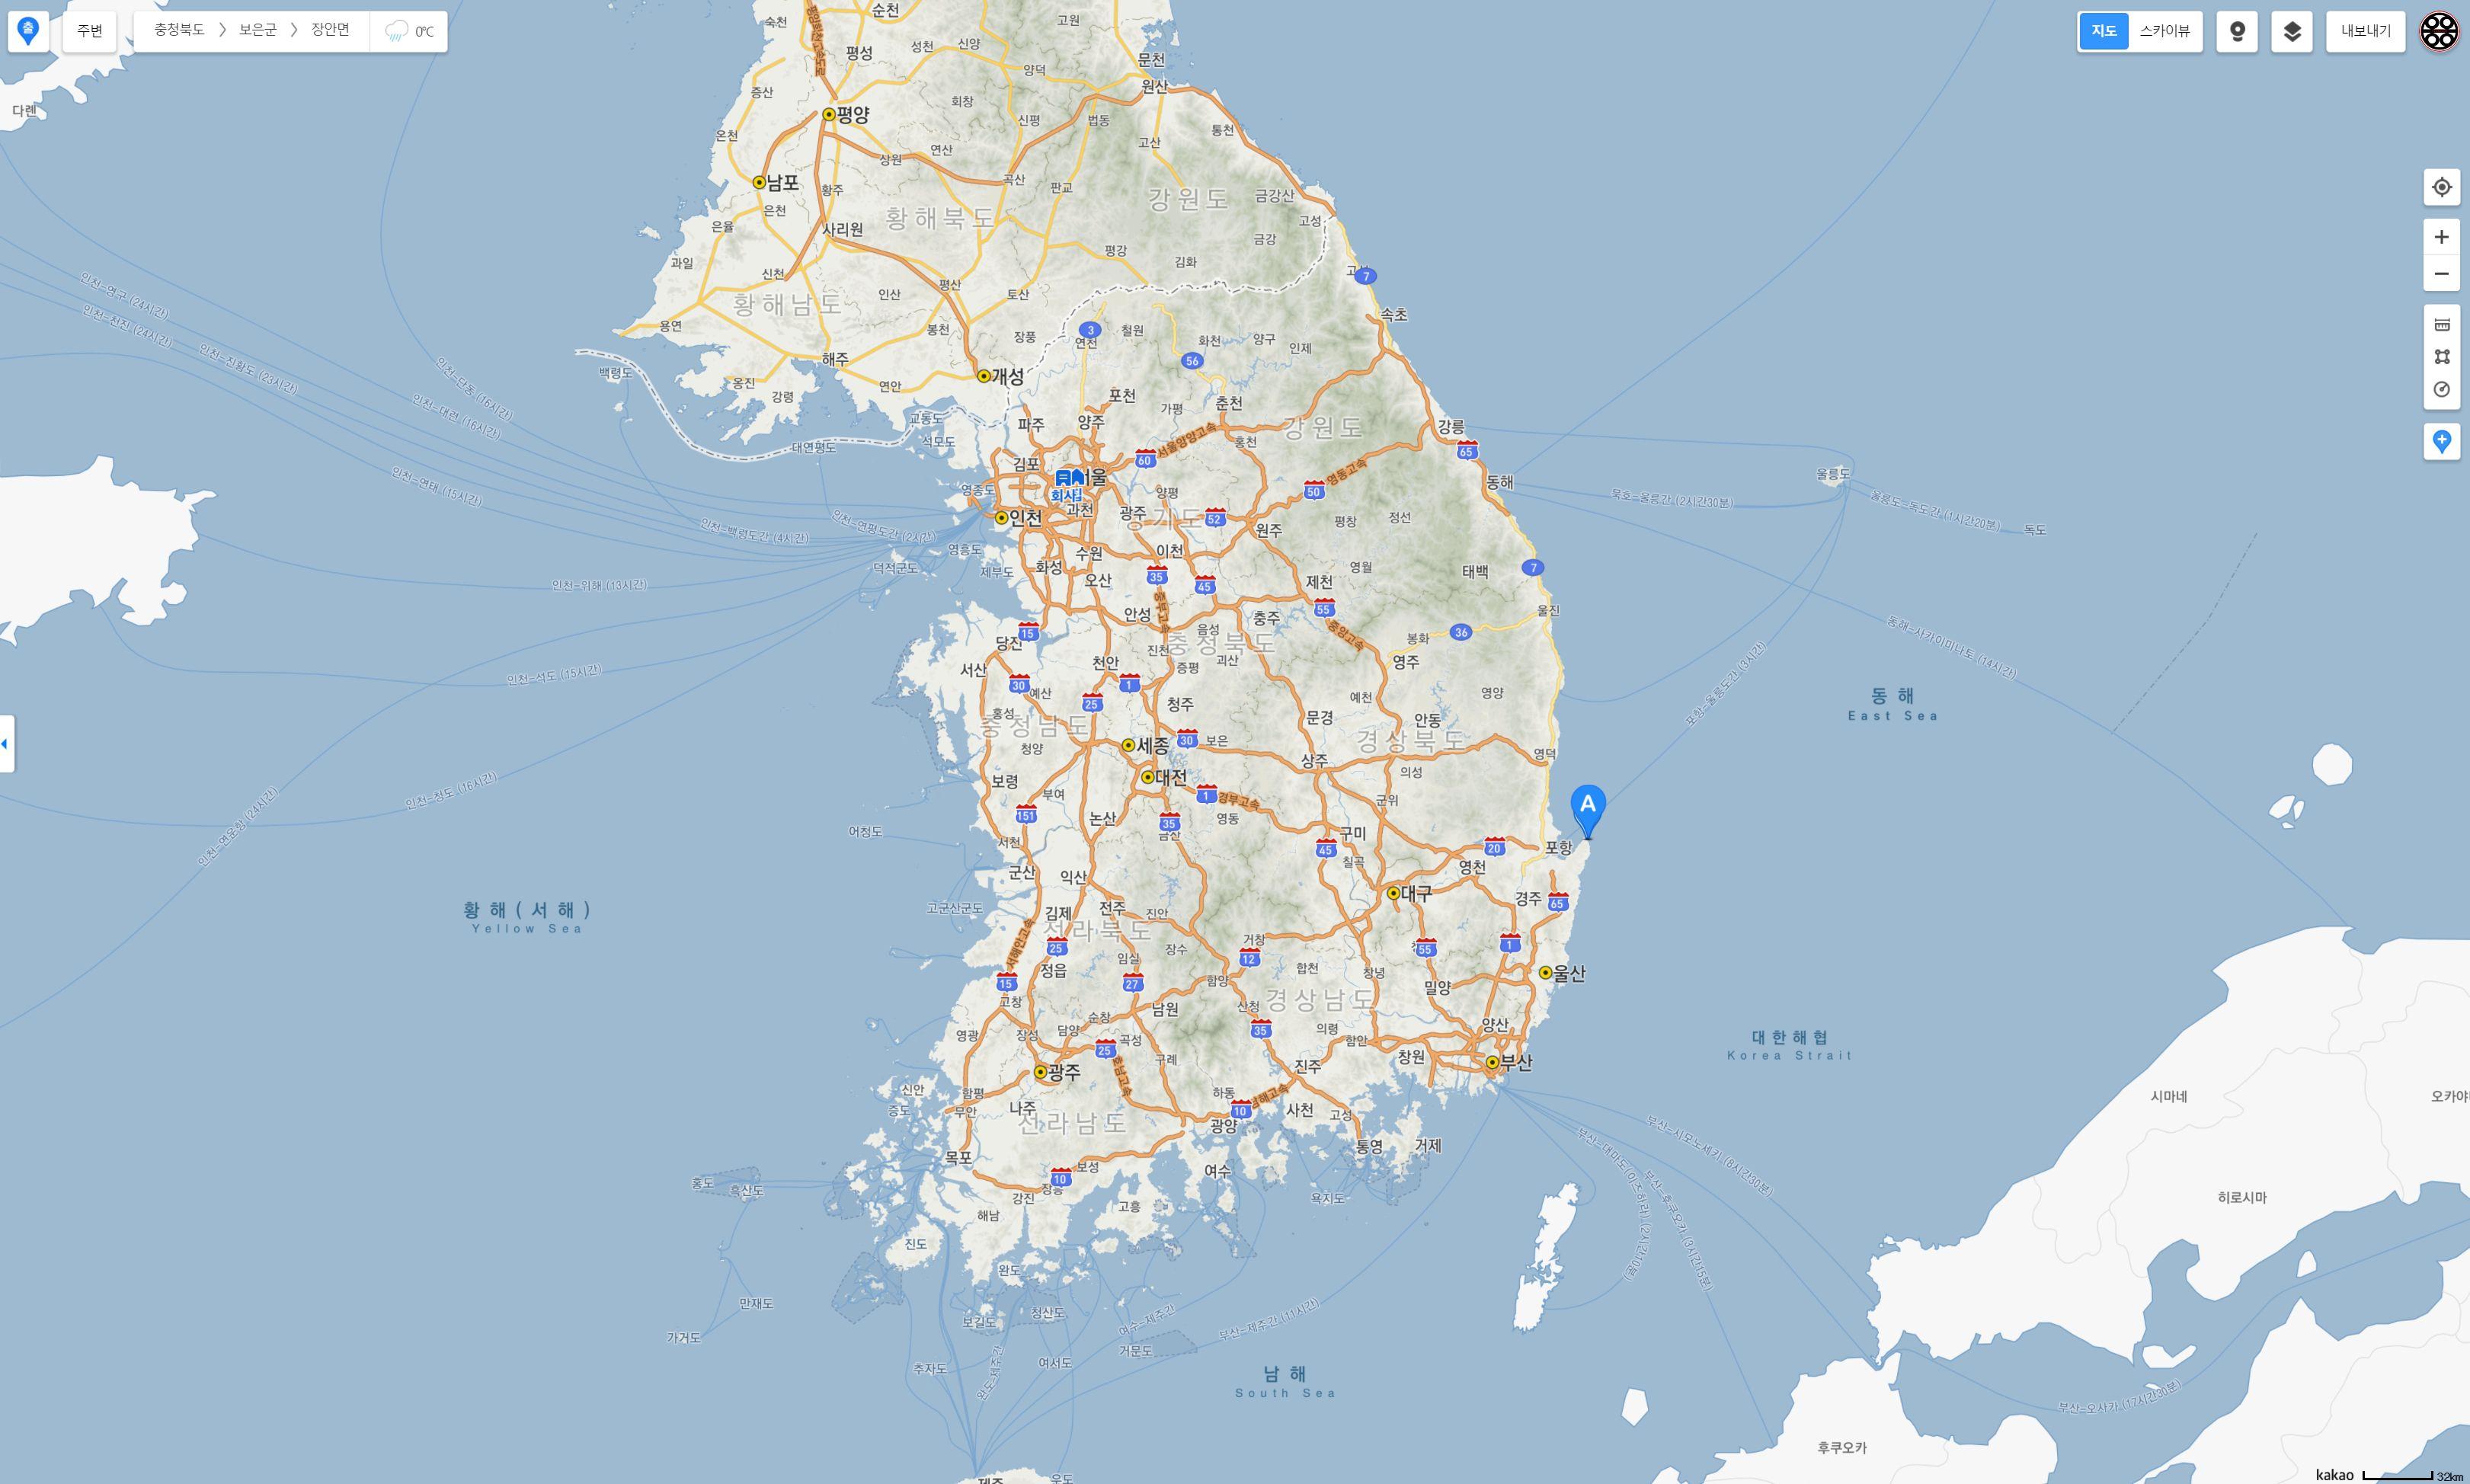 the tail of Korea